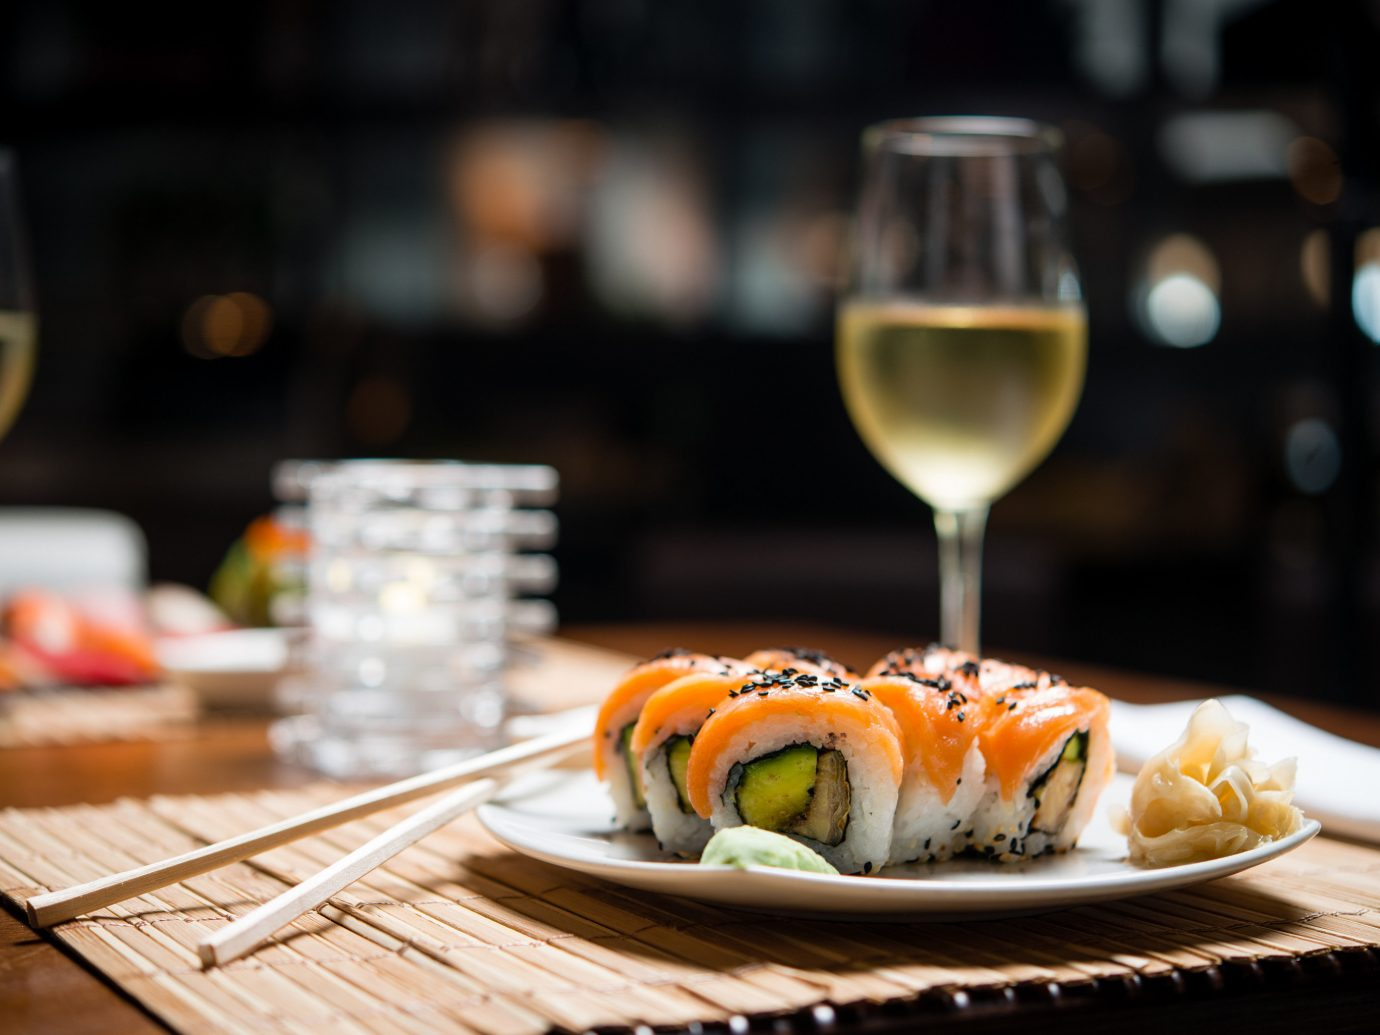 Hotels table food plate wine indoor glass dish meal restaurant cuisine Drink sushi asian food sense brunch close